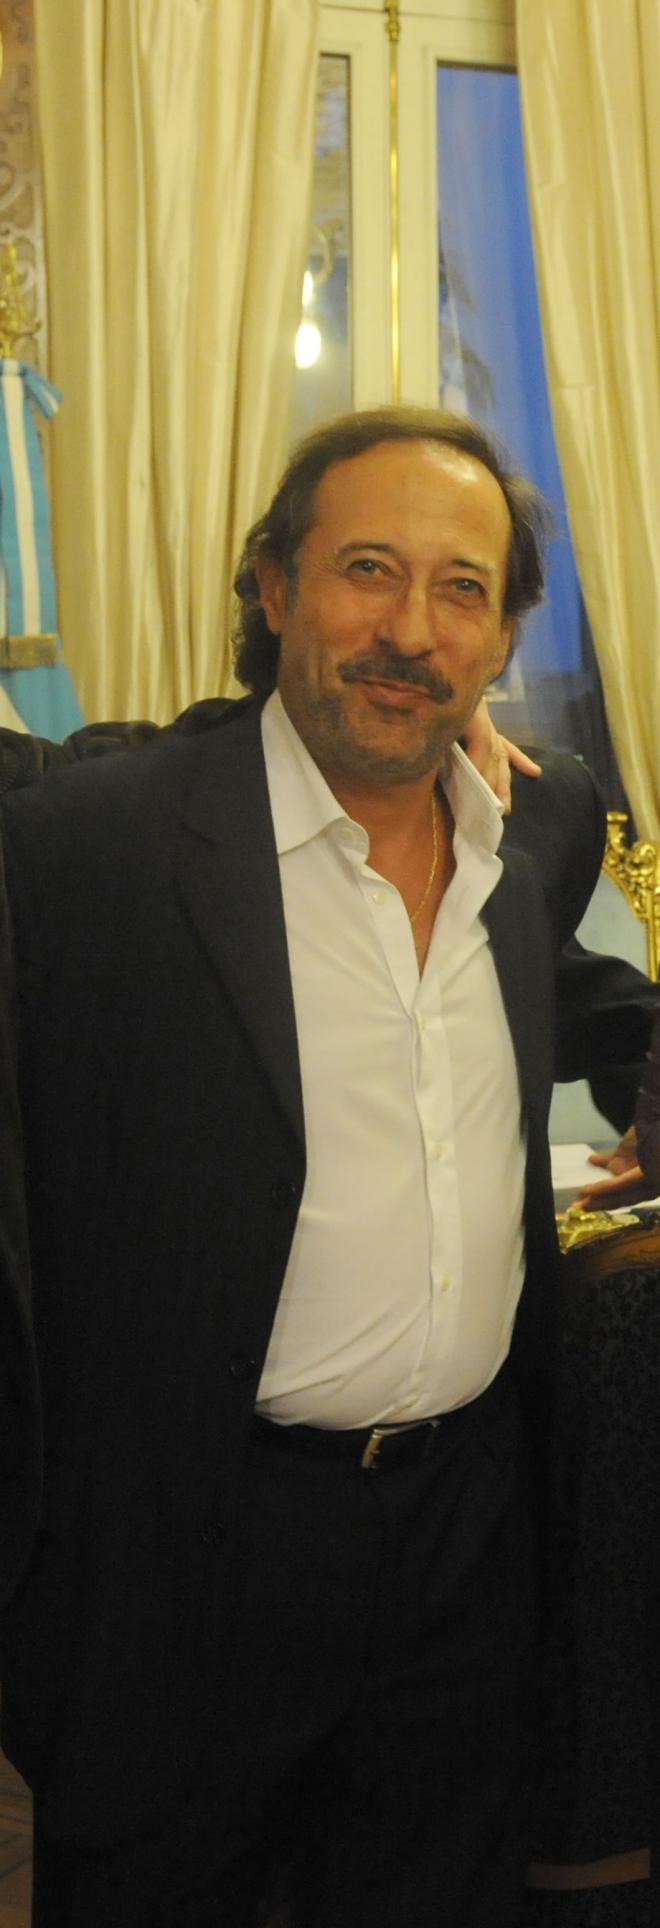 Guillermo Francella Dating